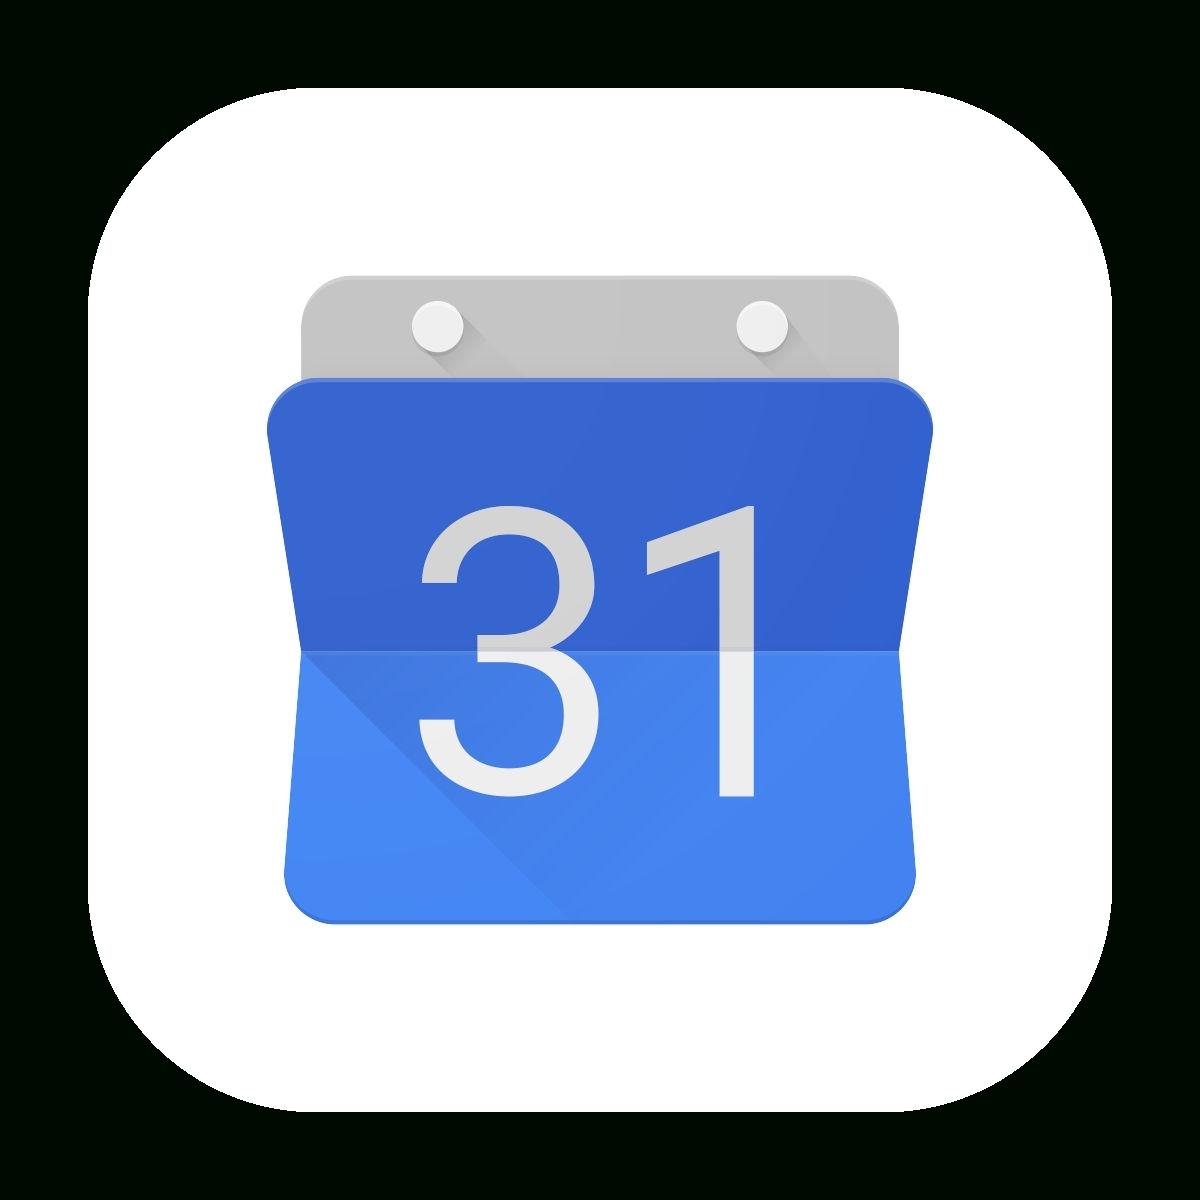 Iphone 5 Calendar Icon Missing • Printable Blank Calendar Template_Iphone 5 Lost Calendar Icon